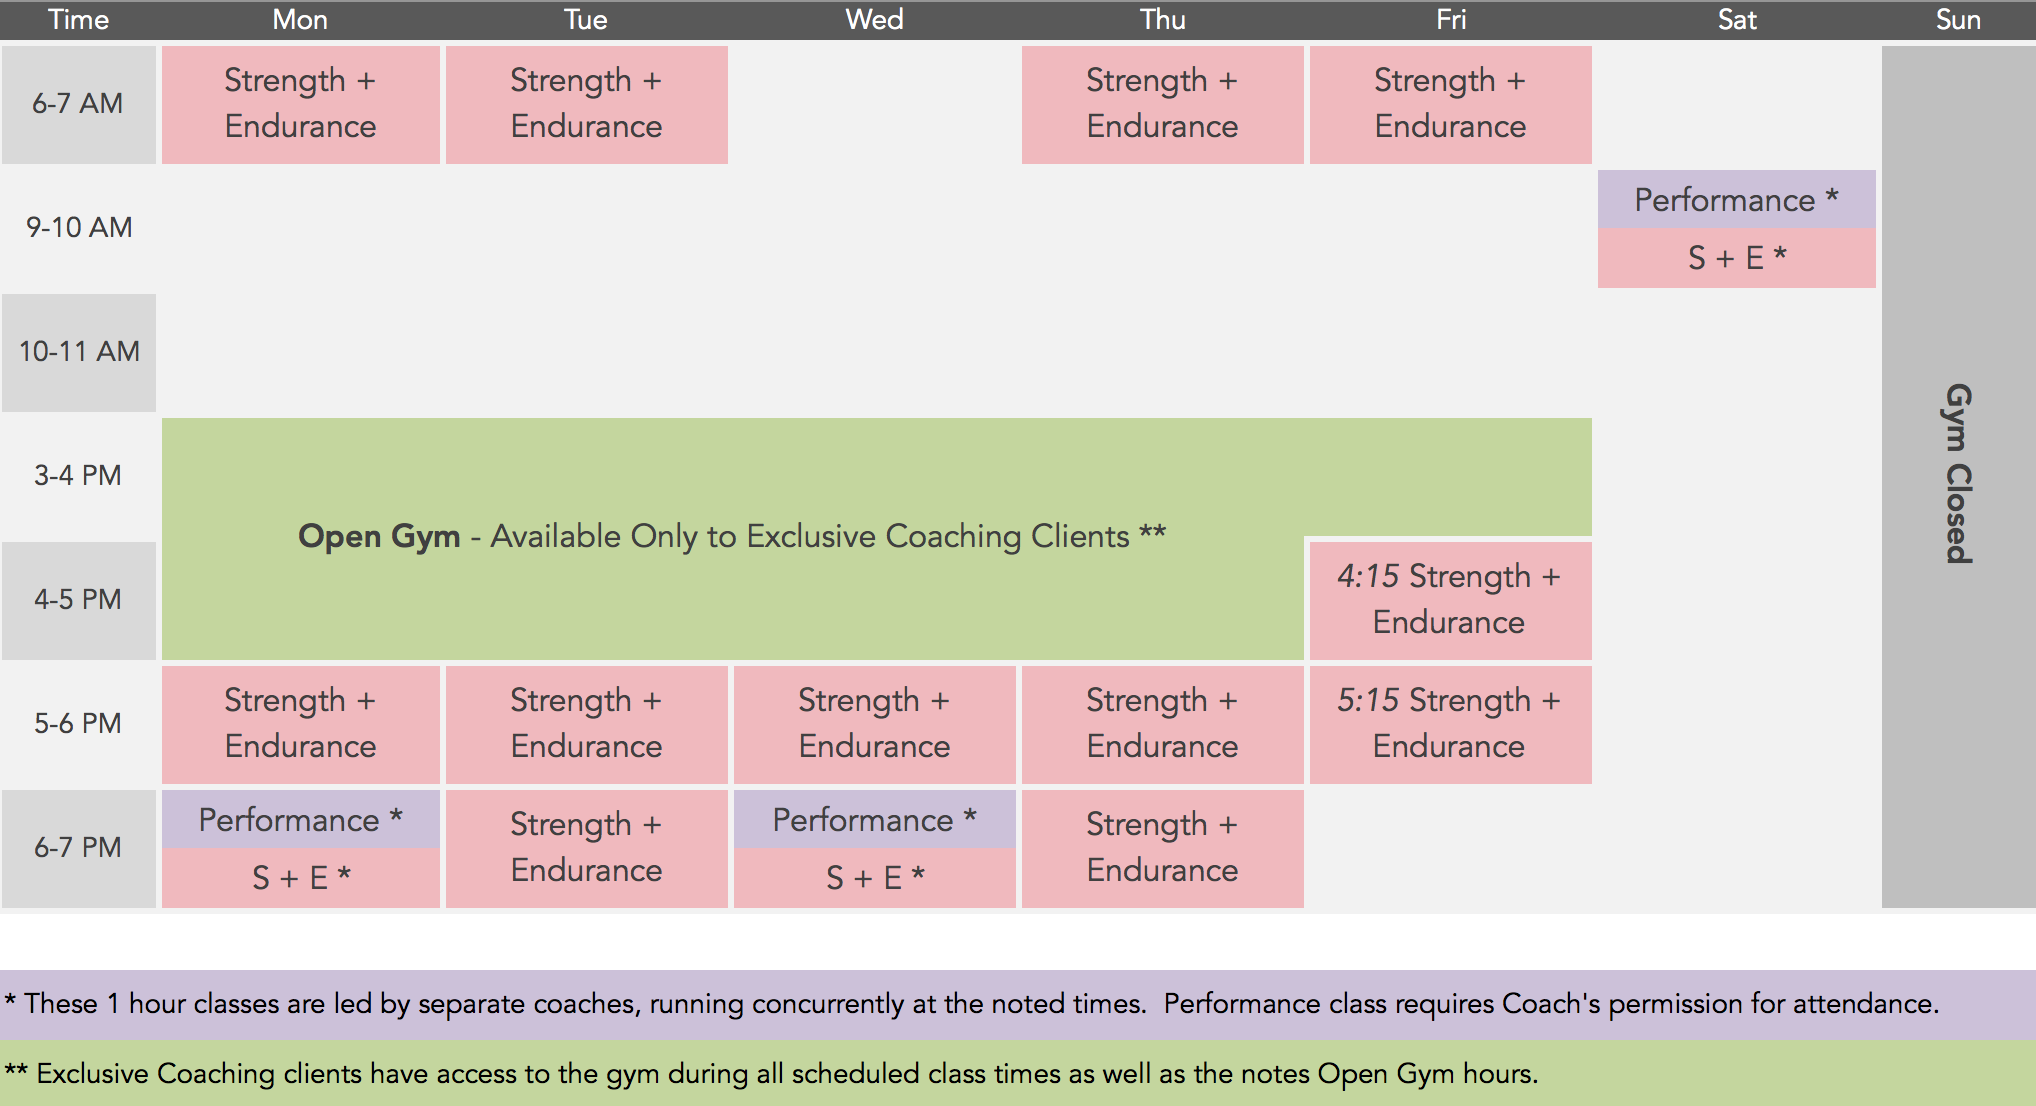 MSP Fitness 2017 Class Schedule